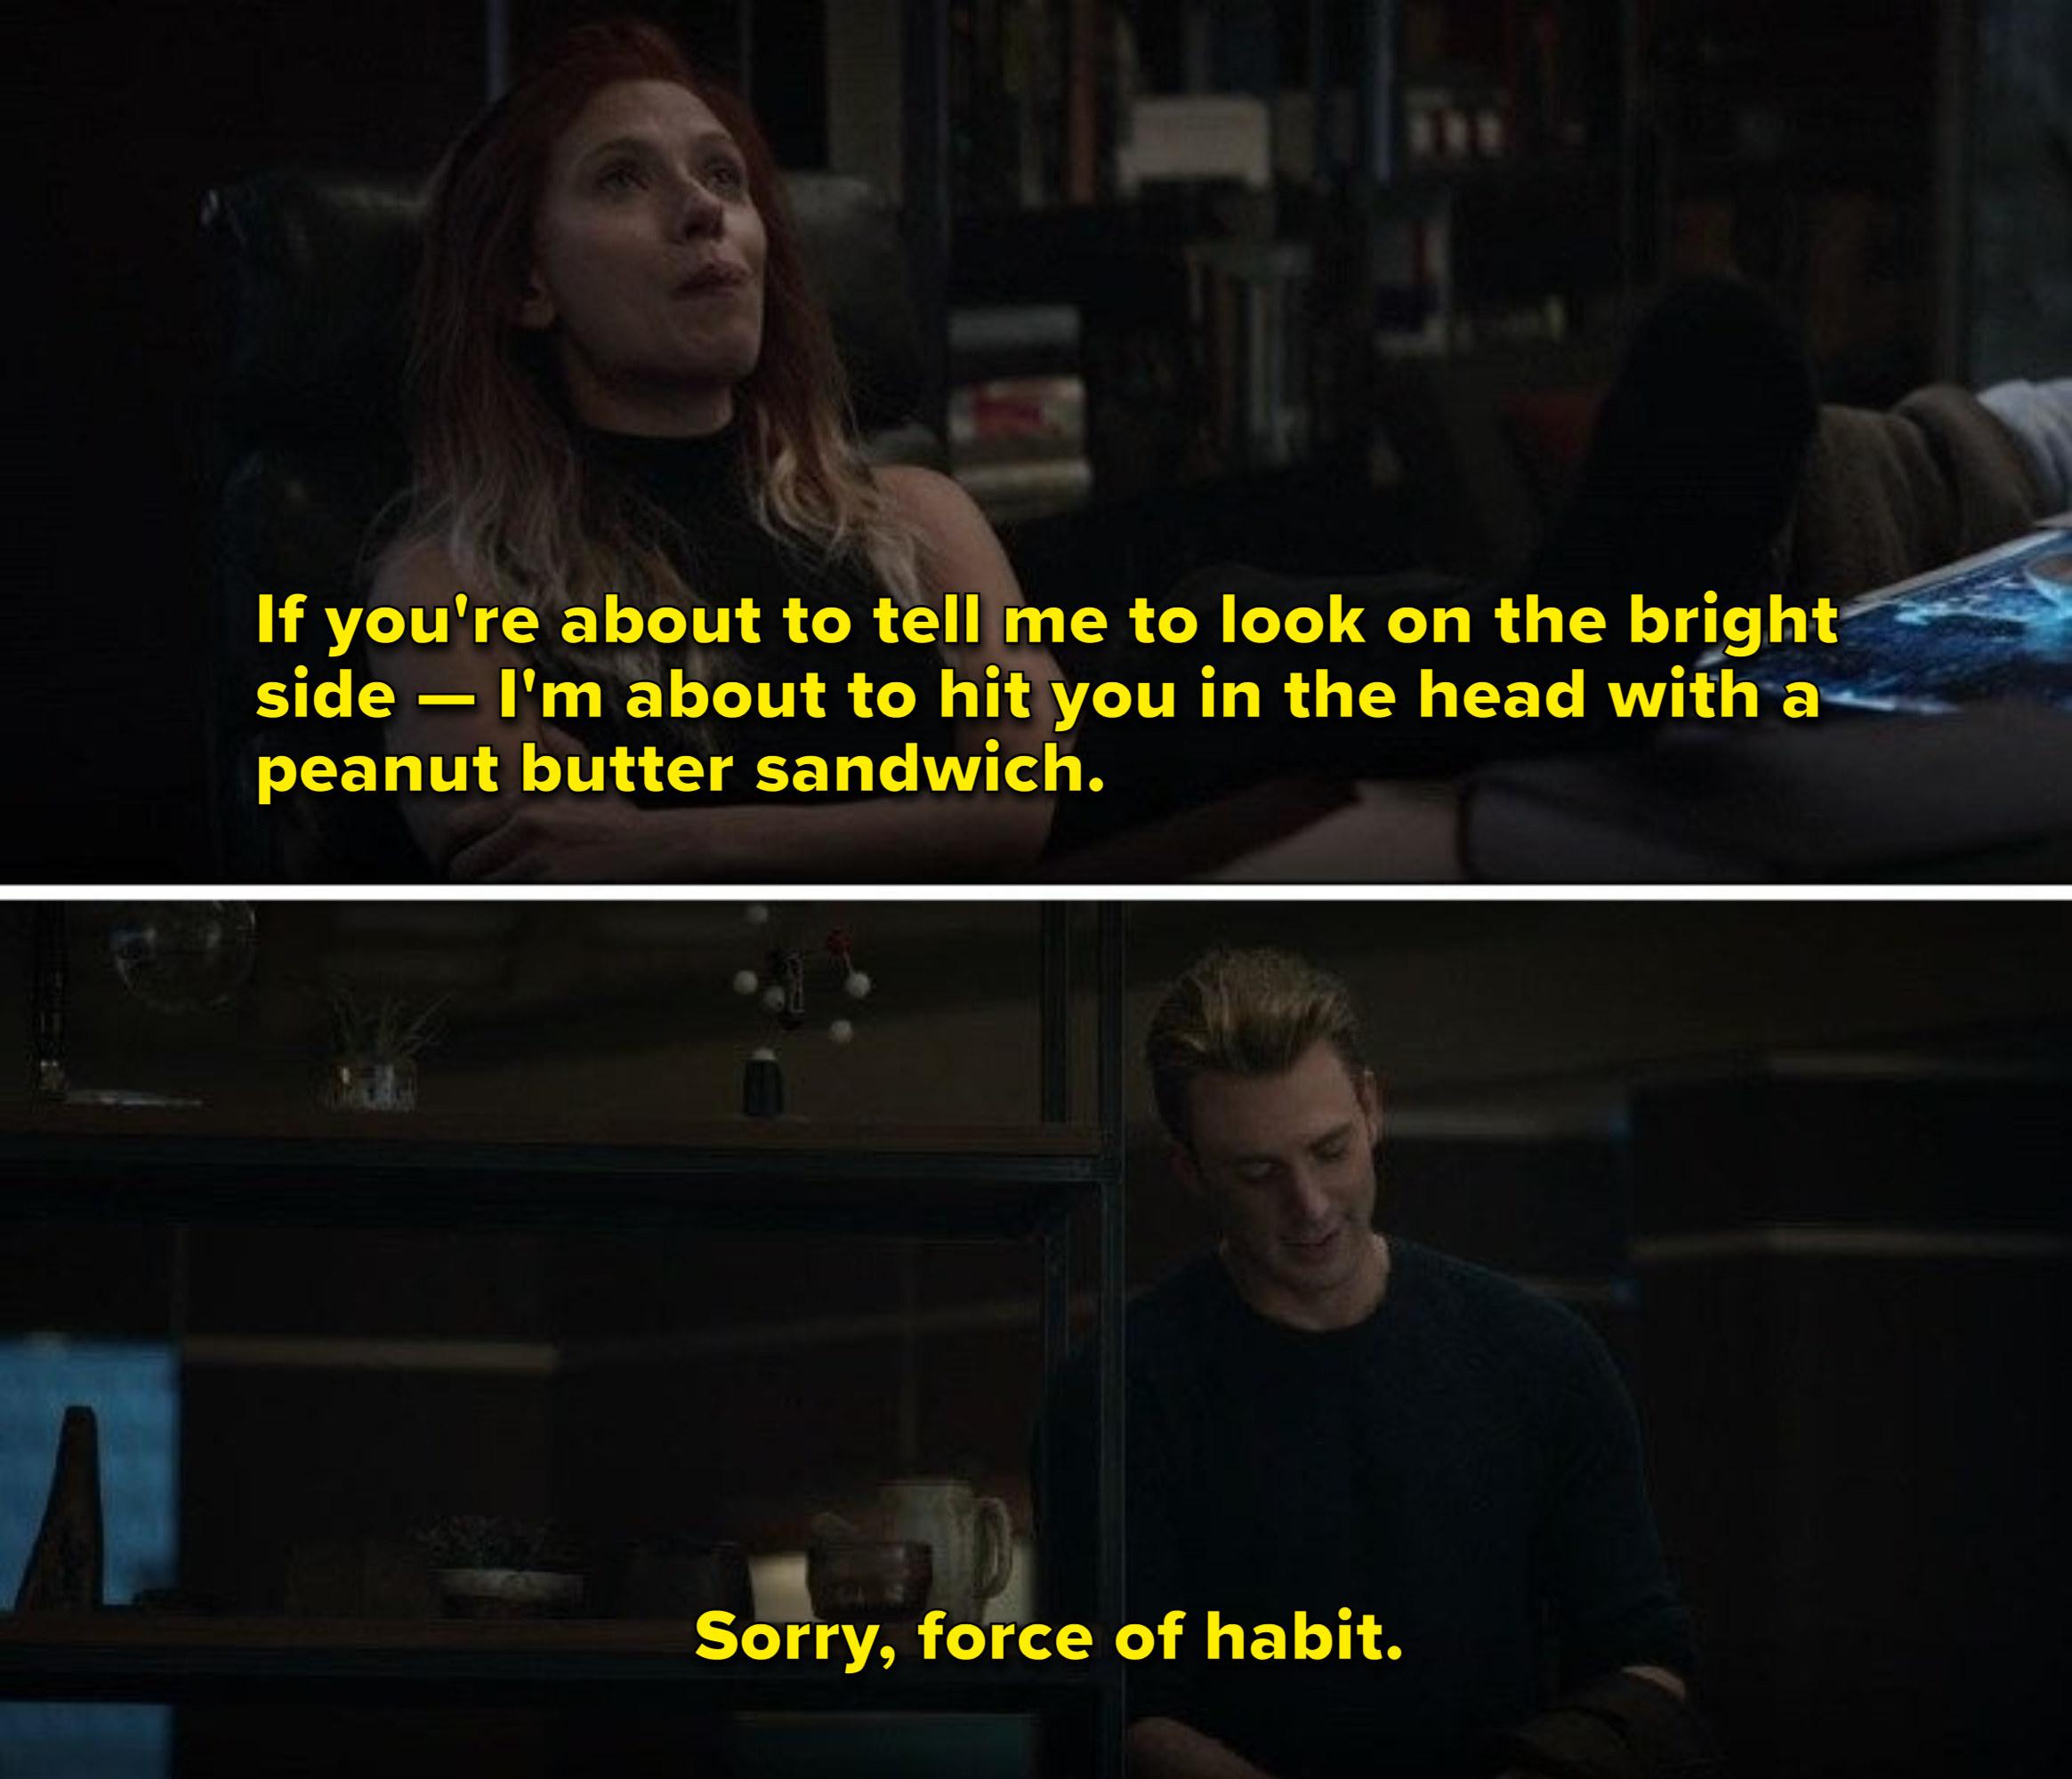 Natasha tells Steve that she'll hit him in the head with a peanut butter sandwich